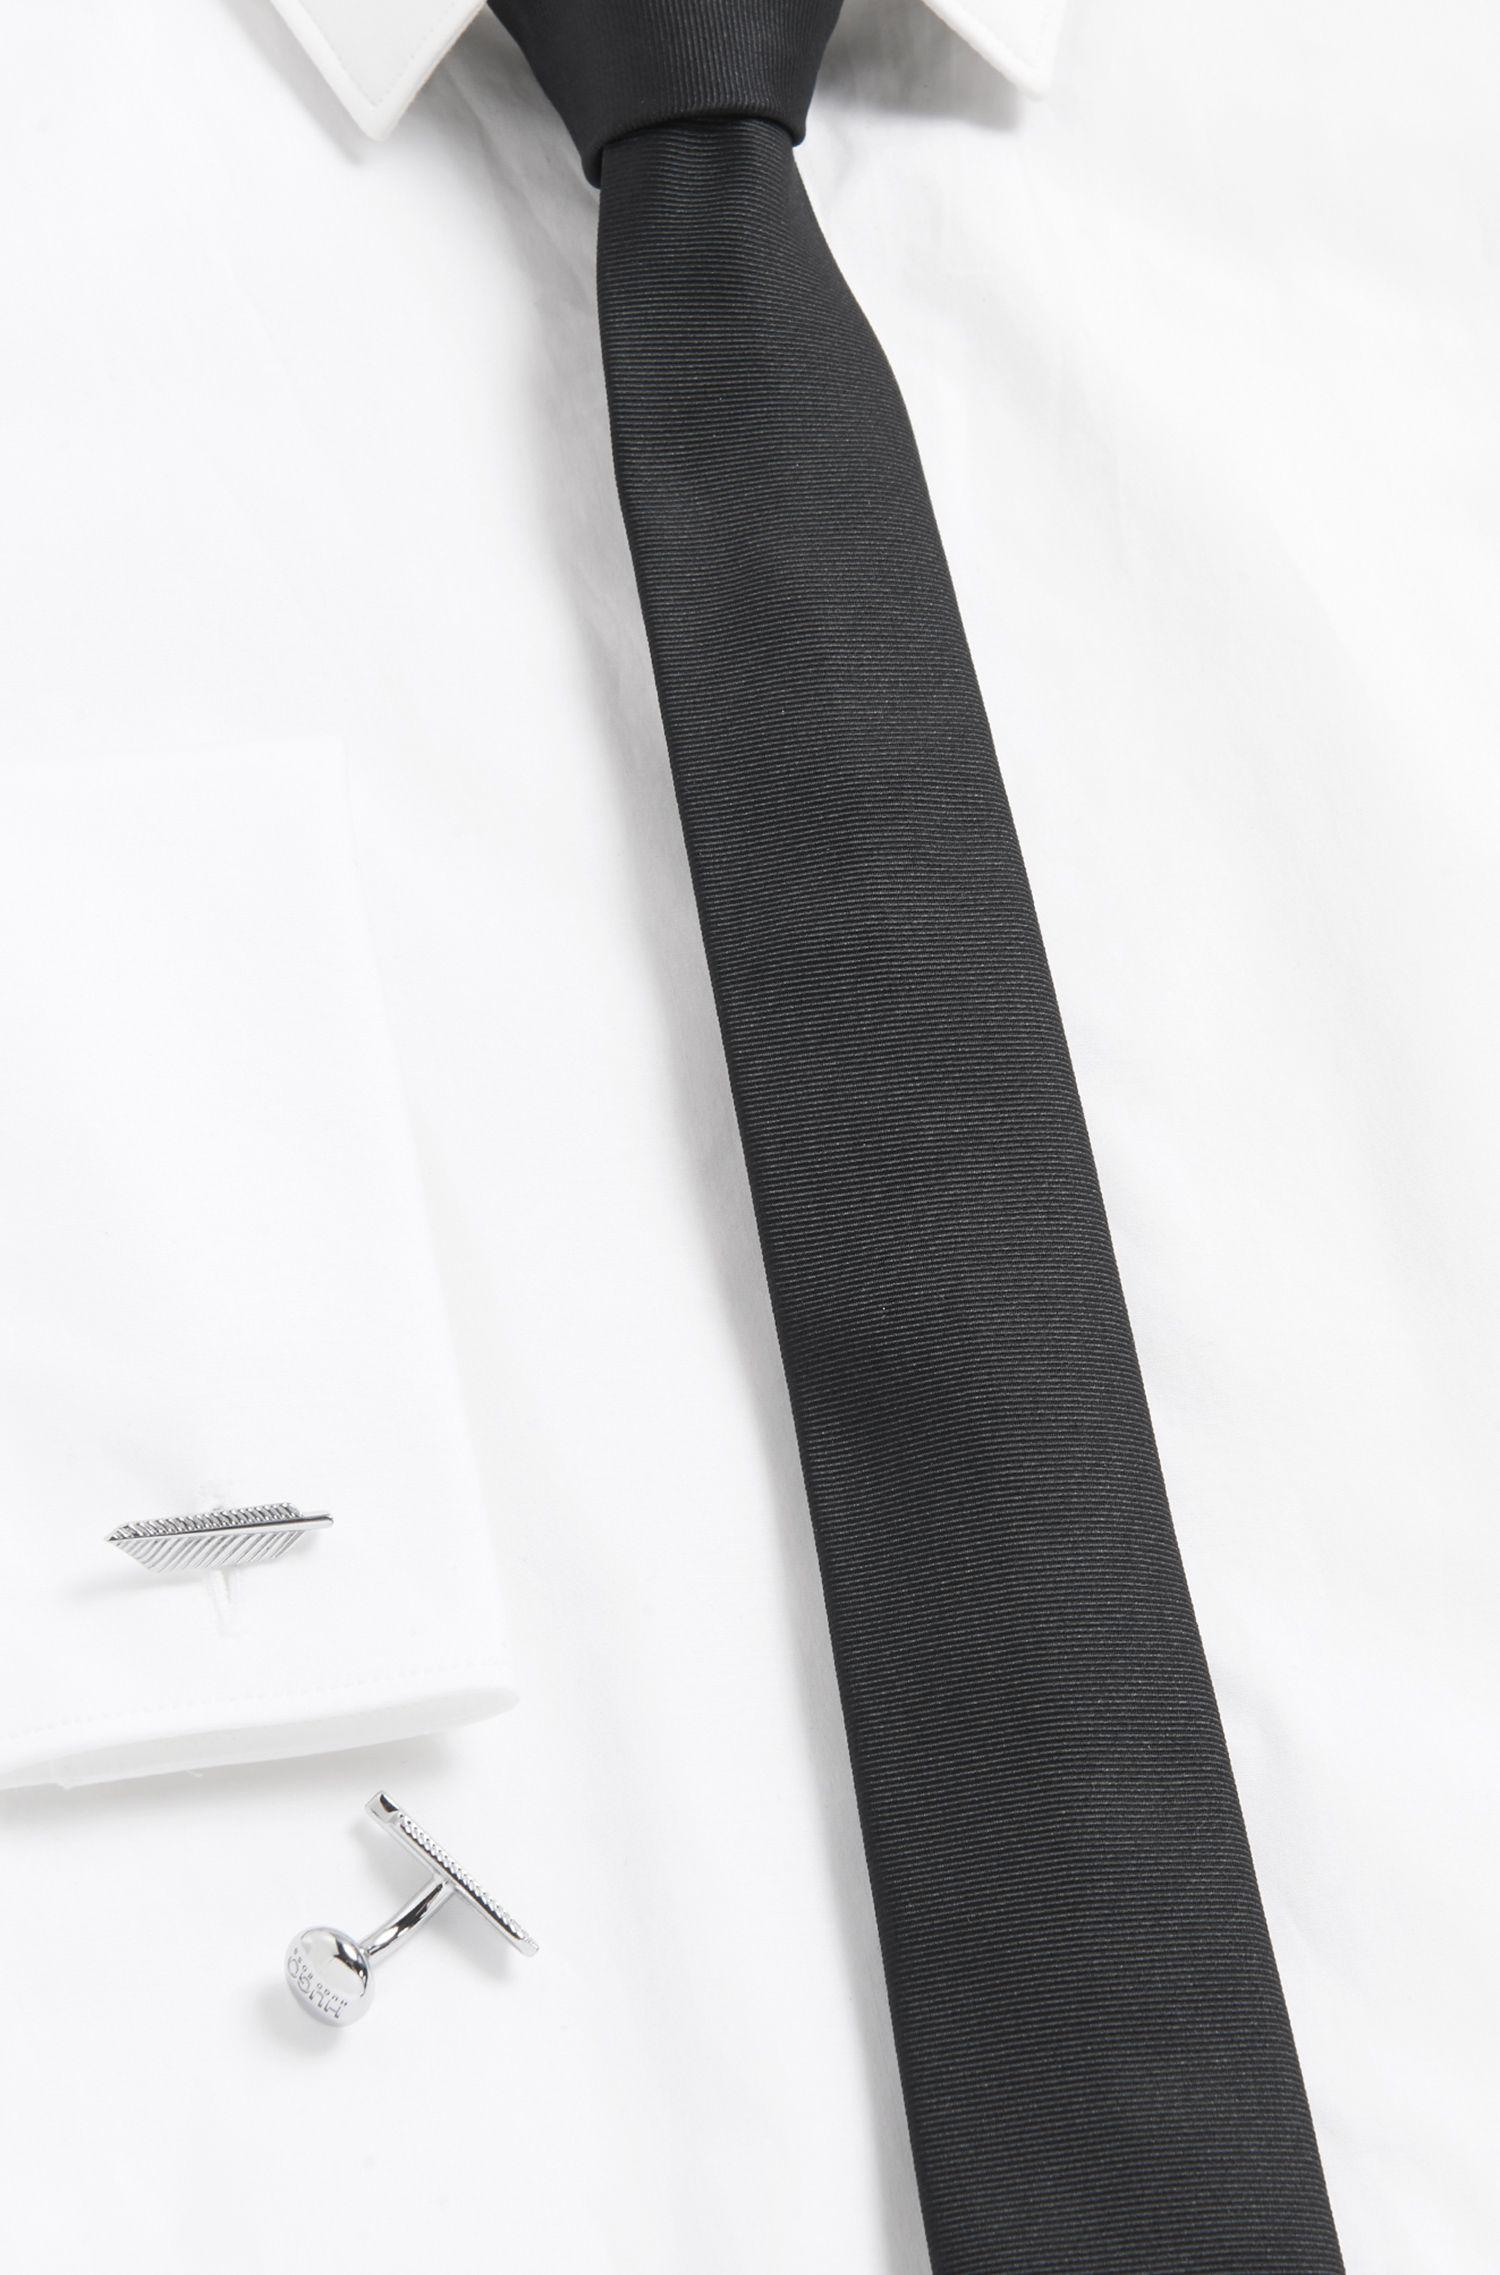 Feather Brass Cufflinks | E Feather, Silver